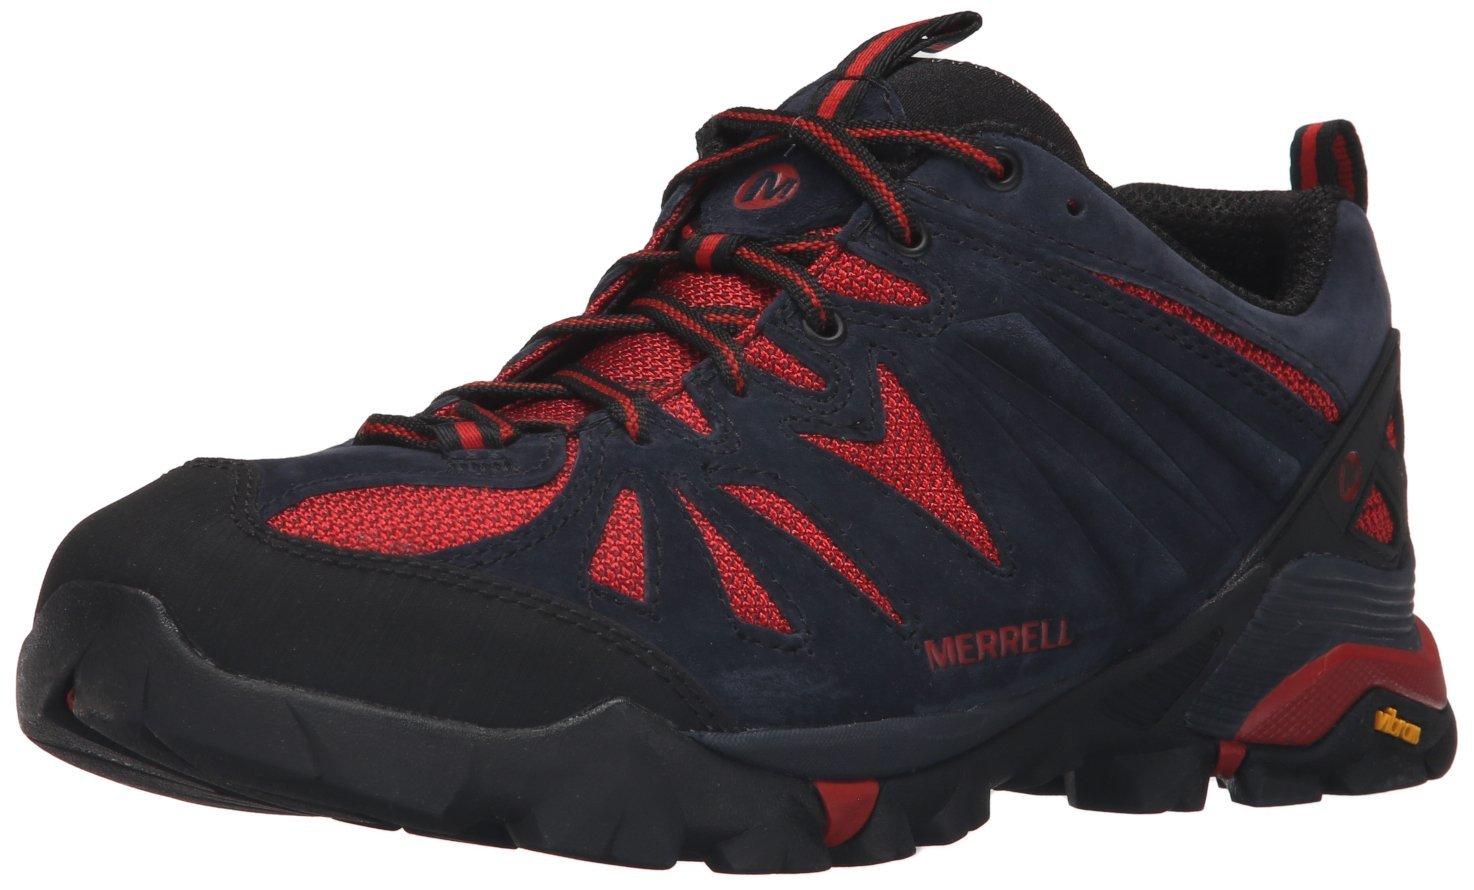 Merrell Men's Capra Hiking Shoe, Navy, 11.5 M US